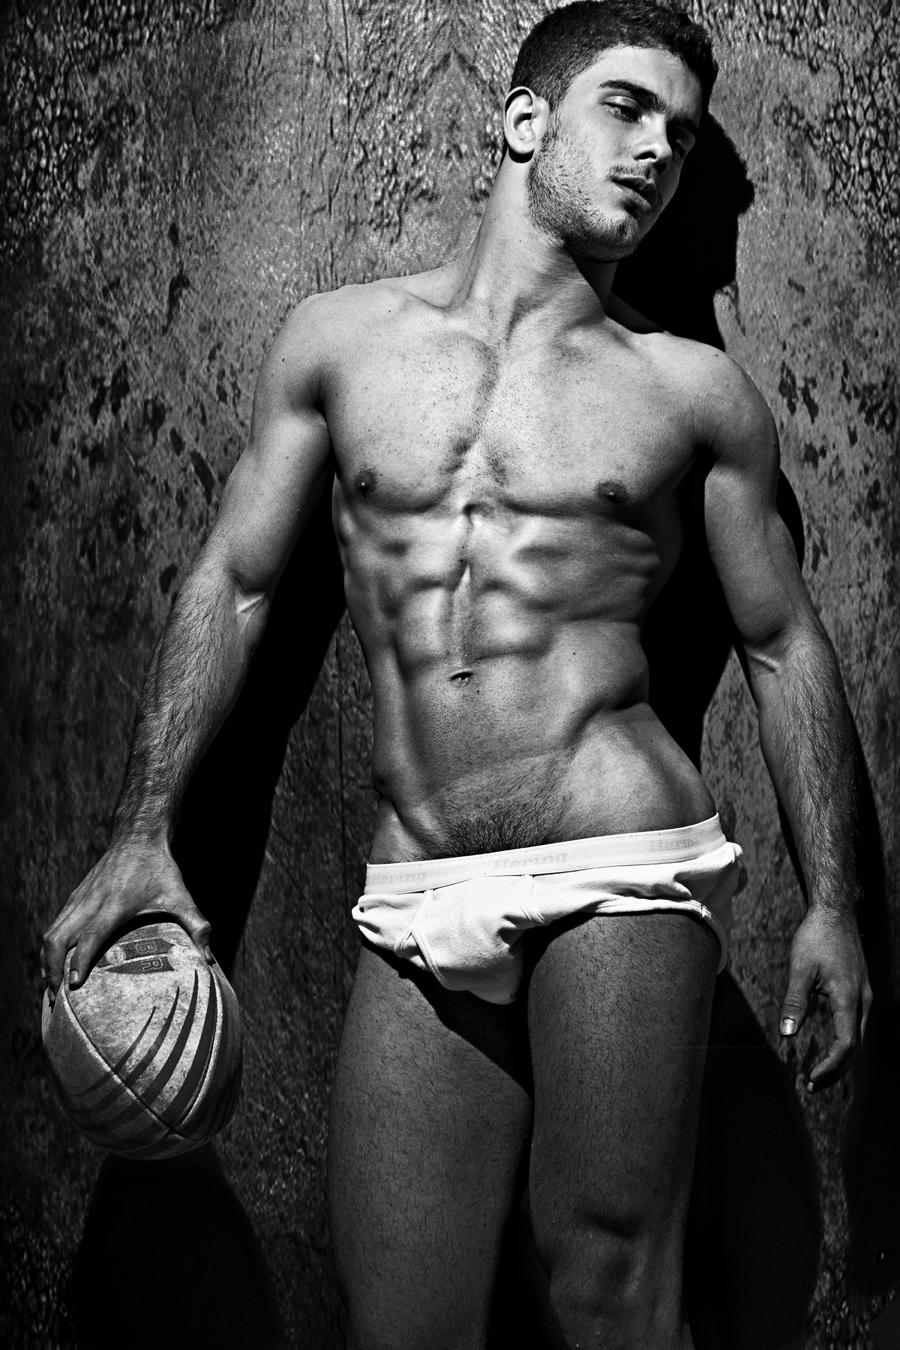 rugby bola2 by gutyerrez